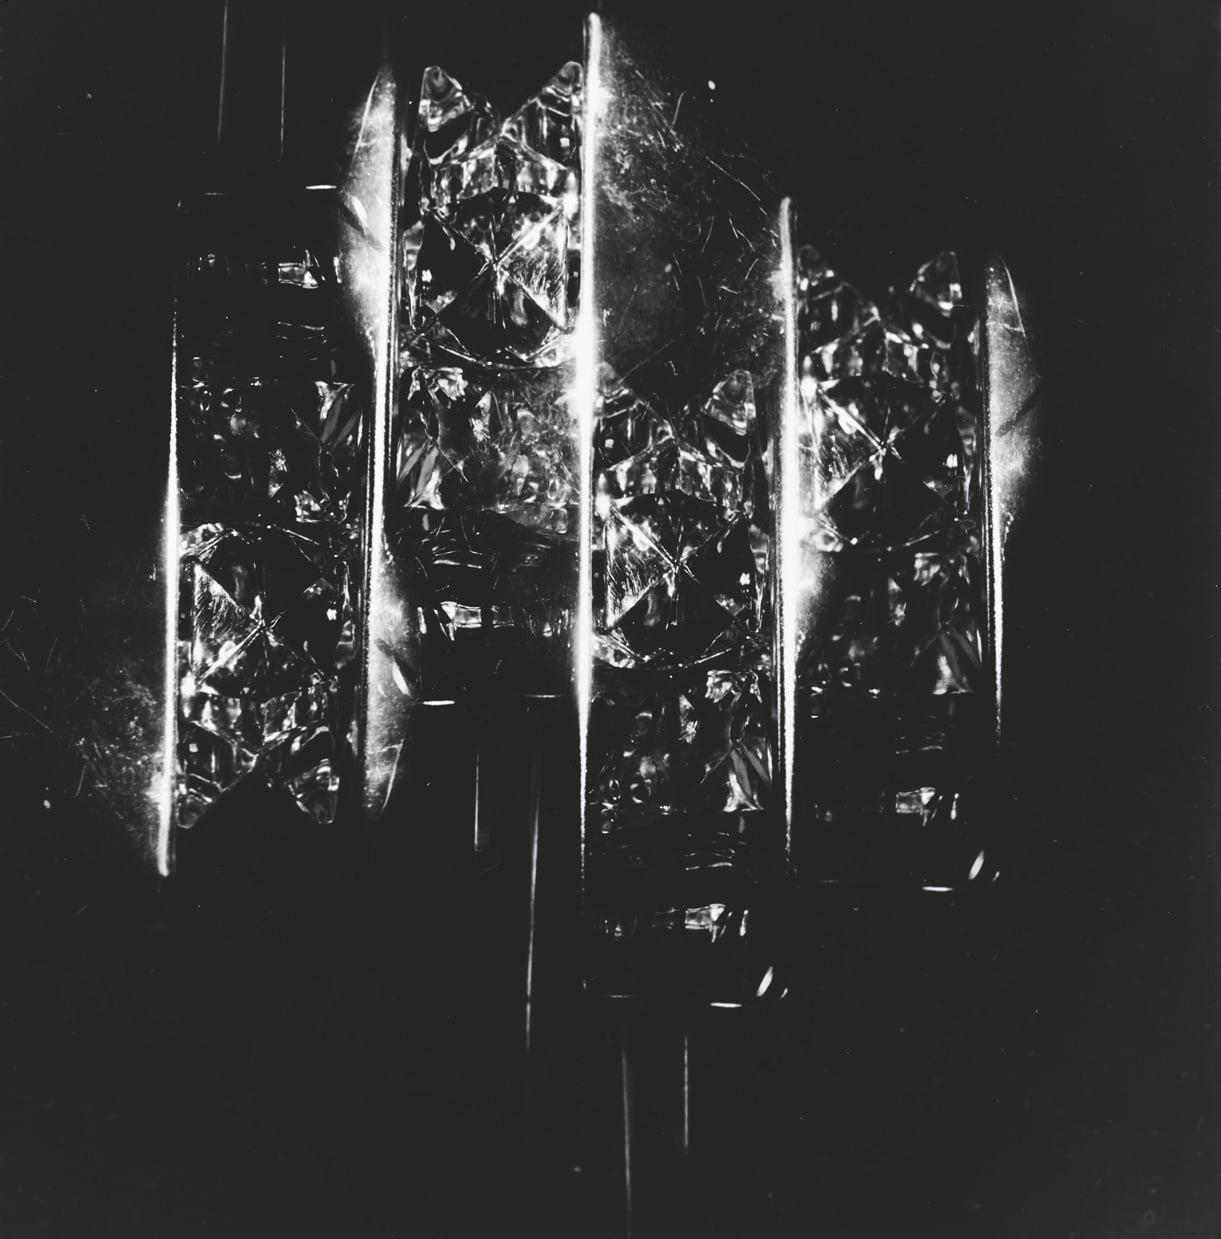 Johanna Daab | Rising Star, 2017 | 82,5 x 82,5 cm, Silbergelatineabzug